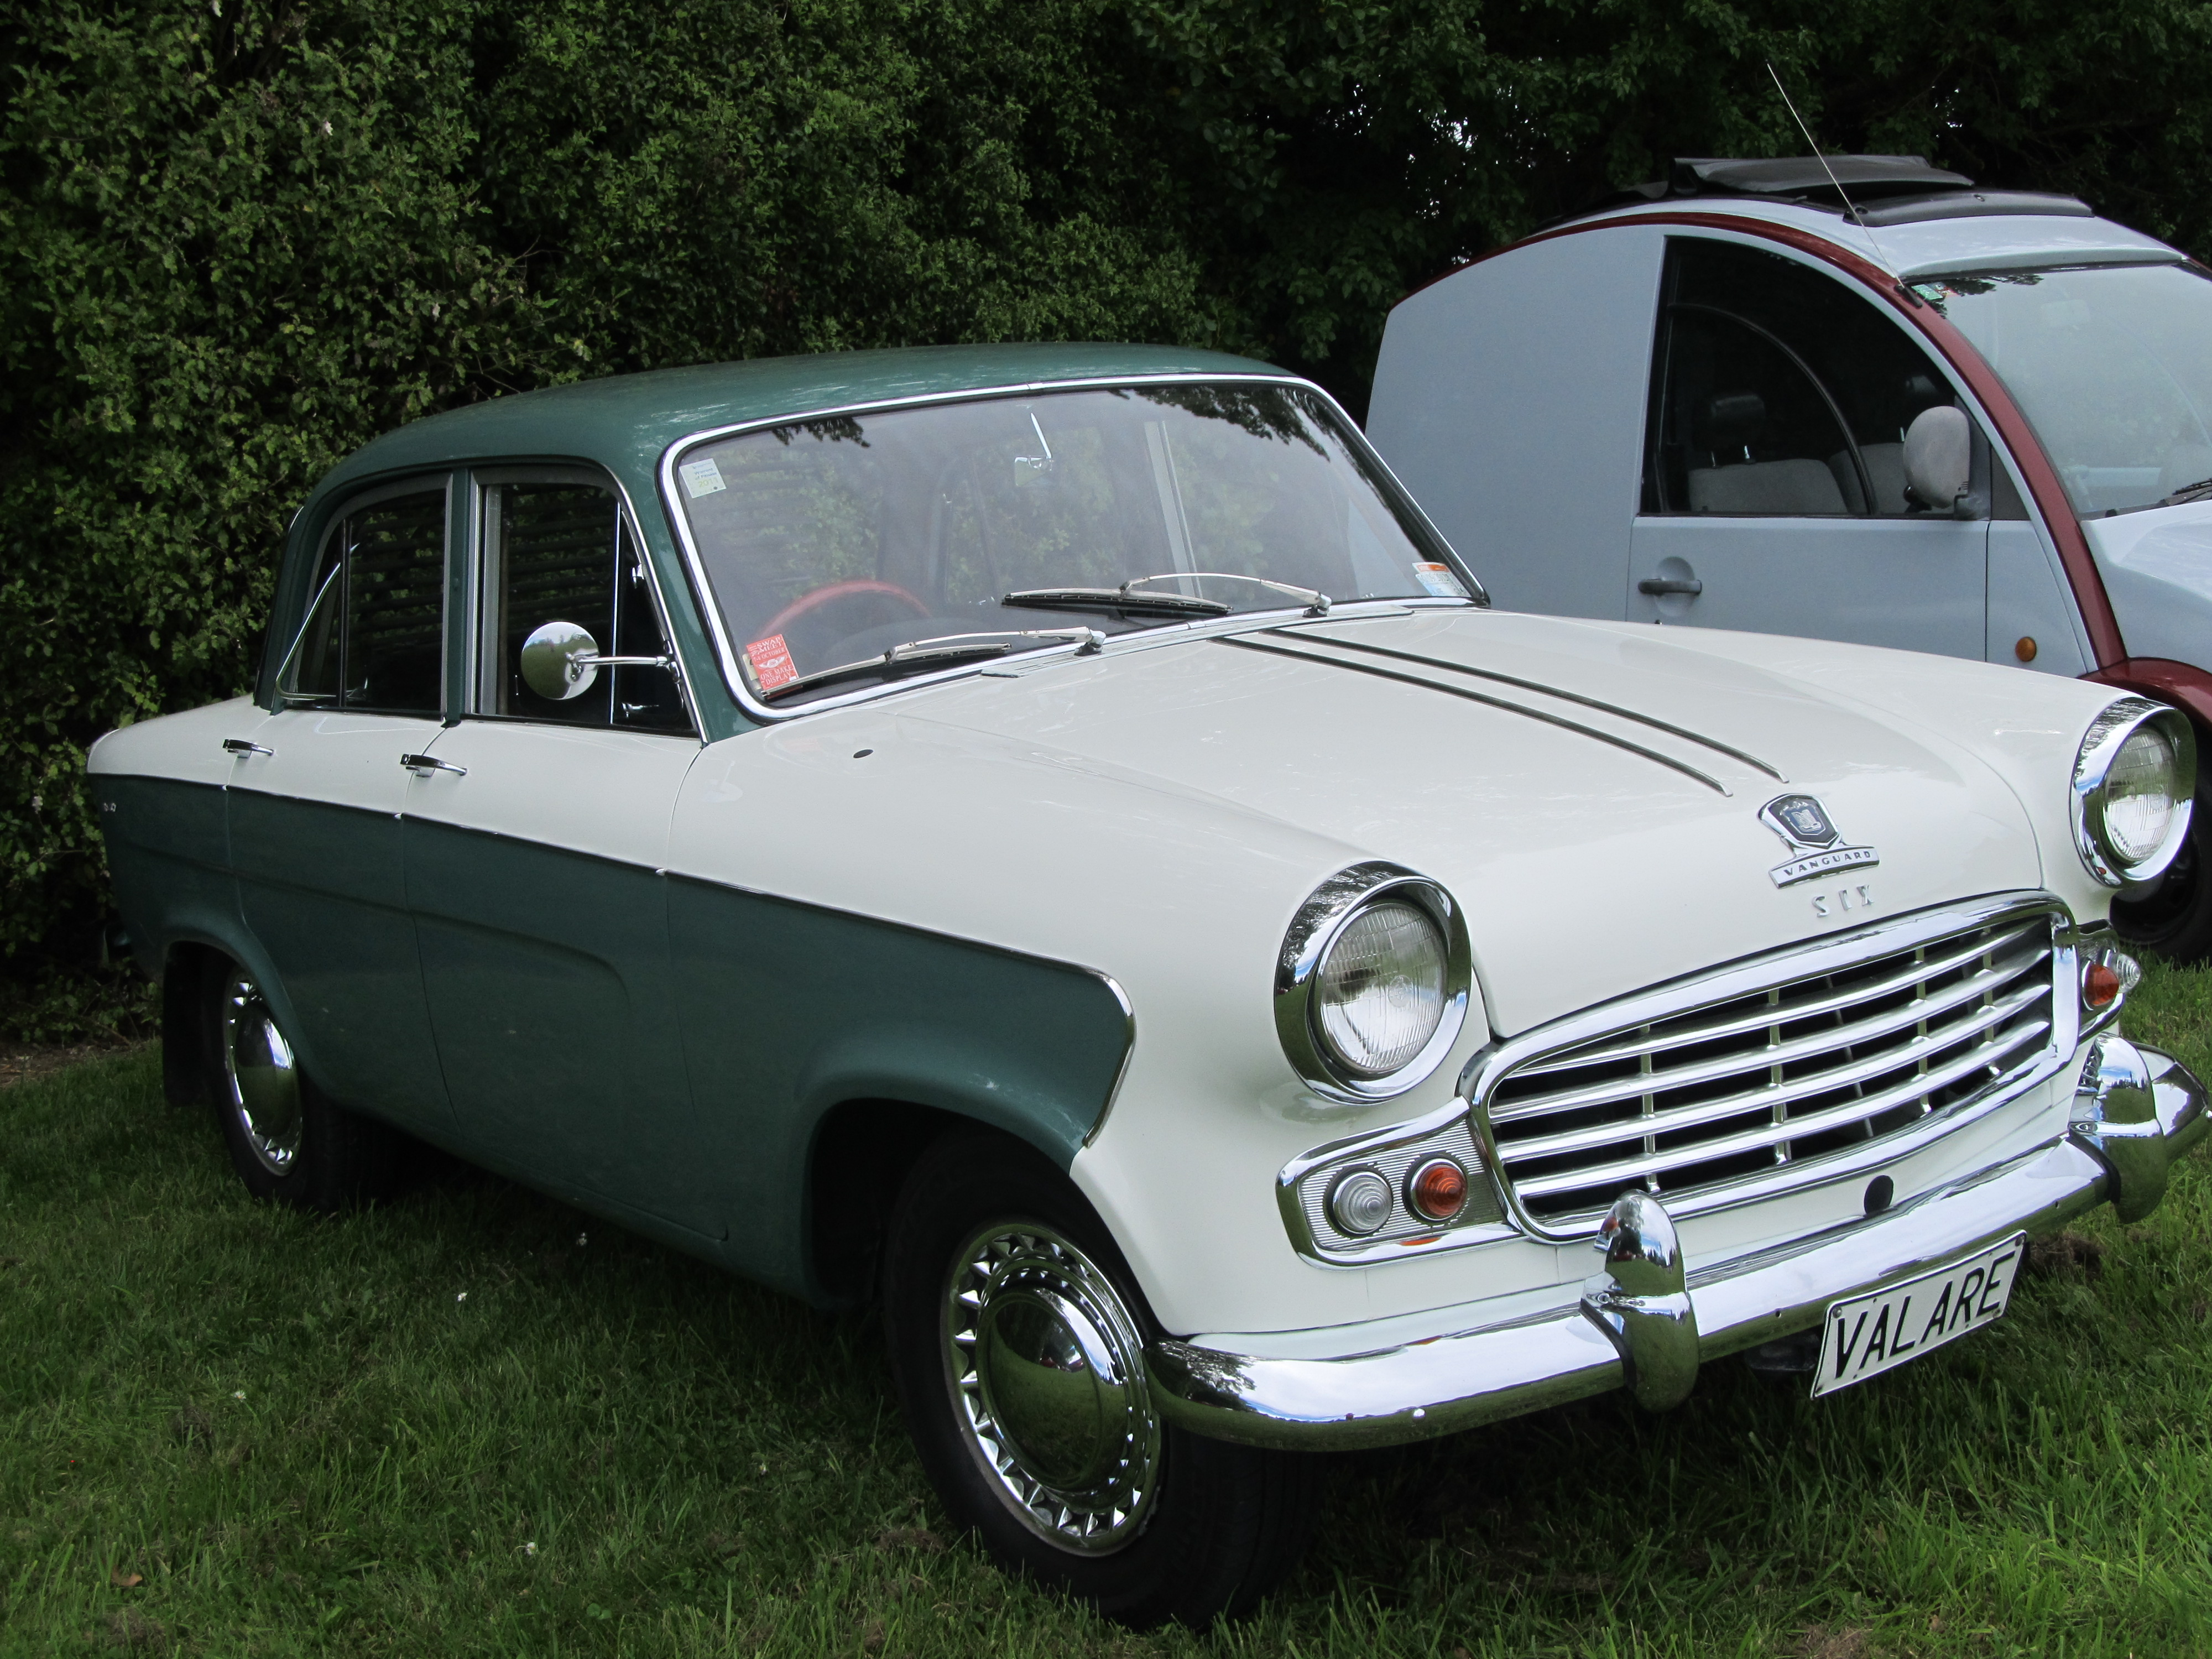 File:1962 Standard Vanguard 6 (6429736339).jpg - Wikimedia Commons